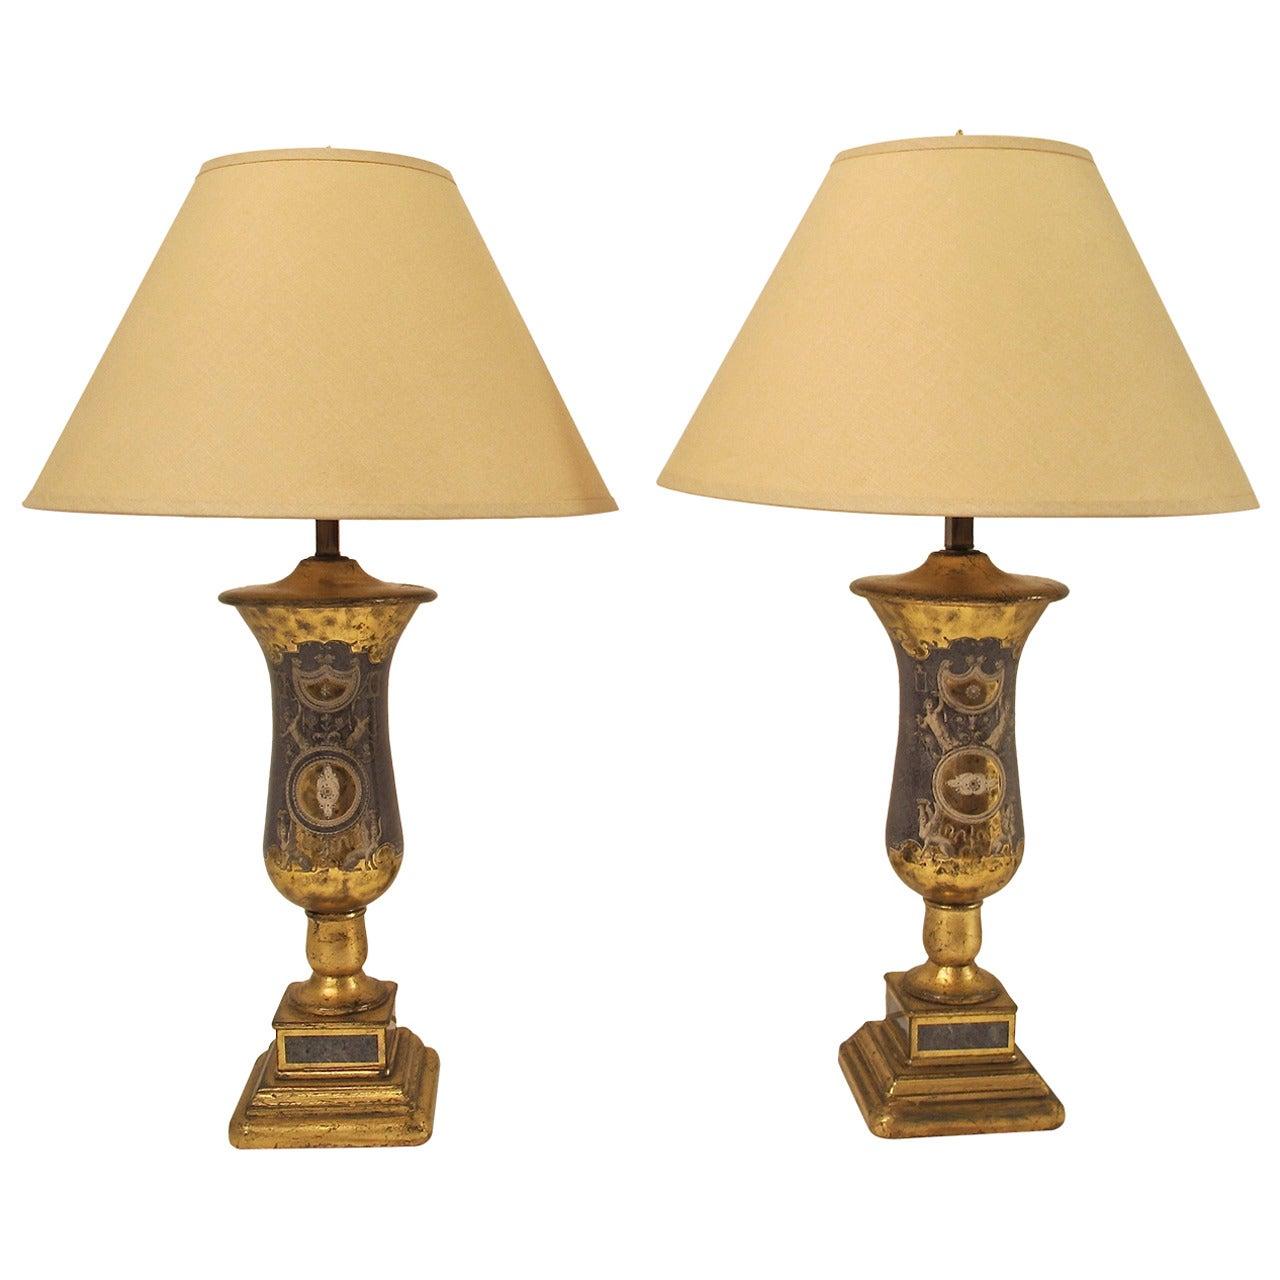 Pair of Italian Églomisé Lamps